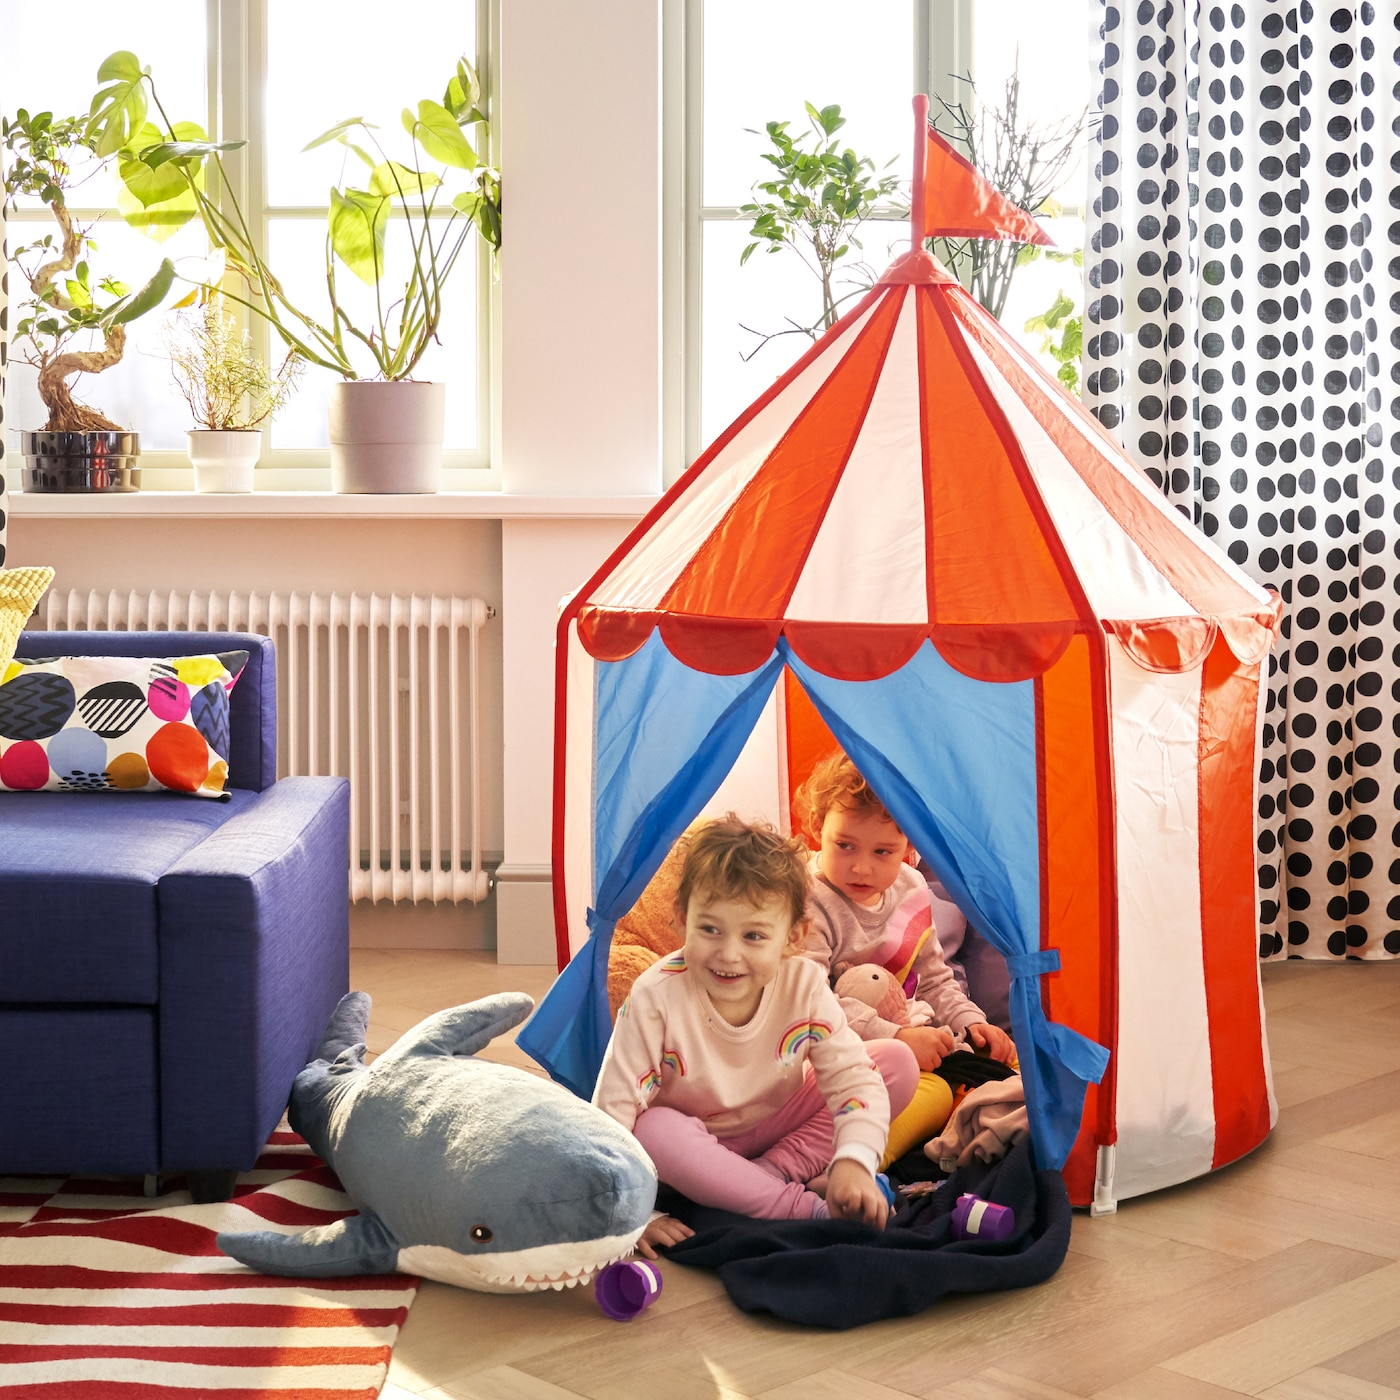 Det superfunktionella vardagsrummet IKEA